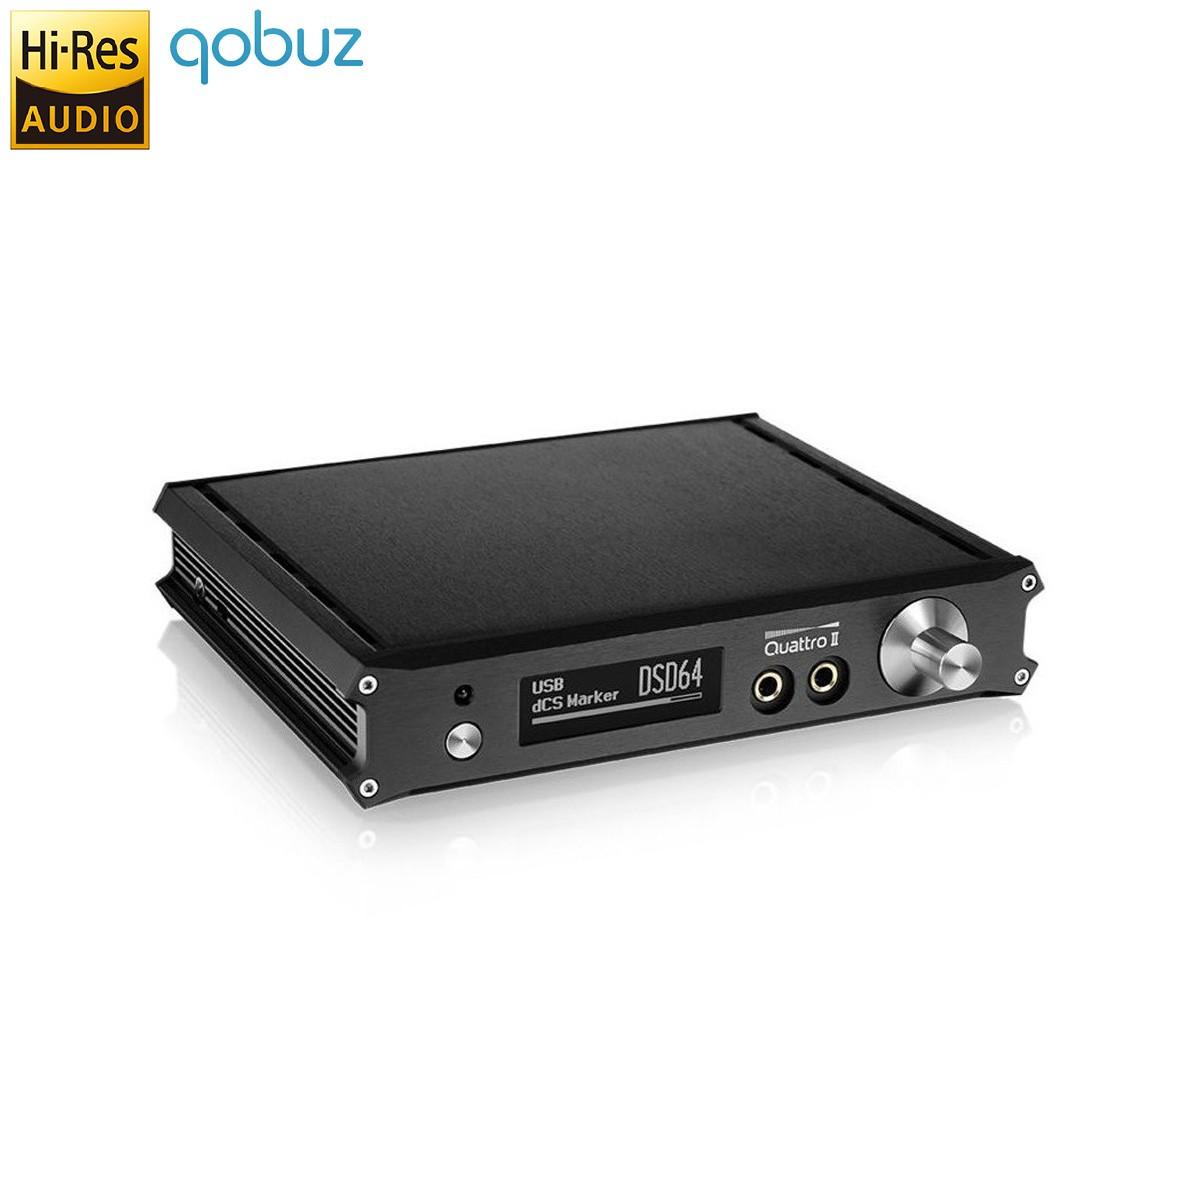 MATRIX QUATTRO II ADVANCED DAC ES9018S 32bit/384kHz DSD / Ampli Casque